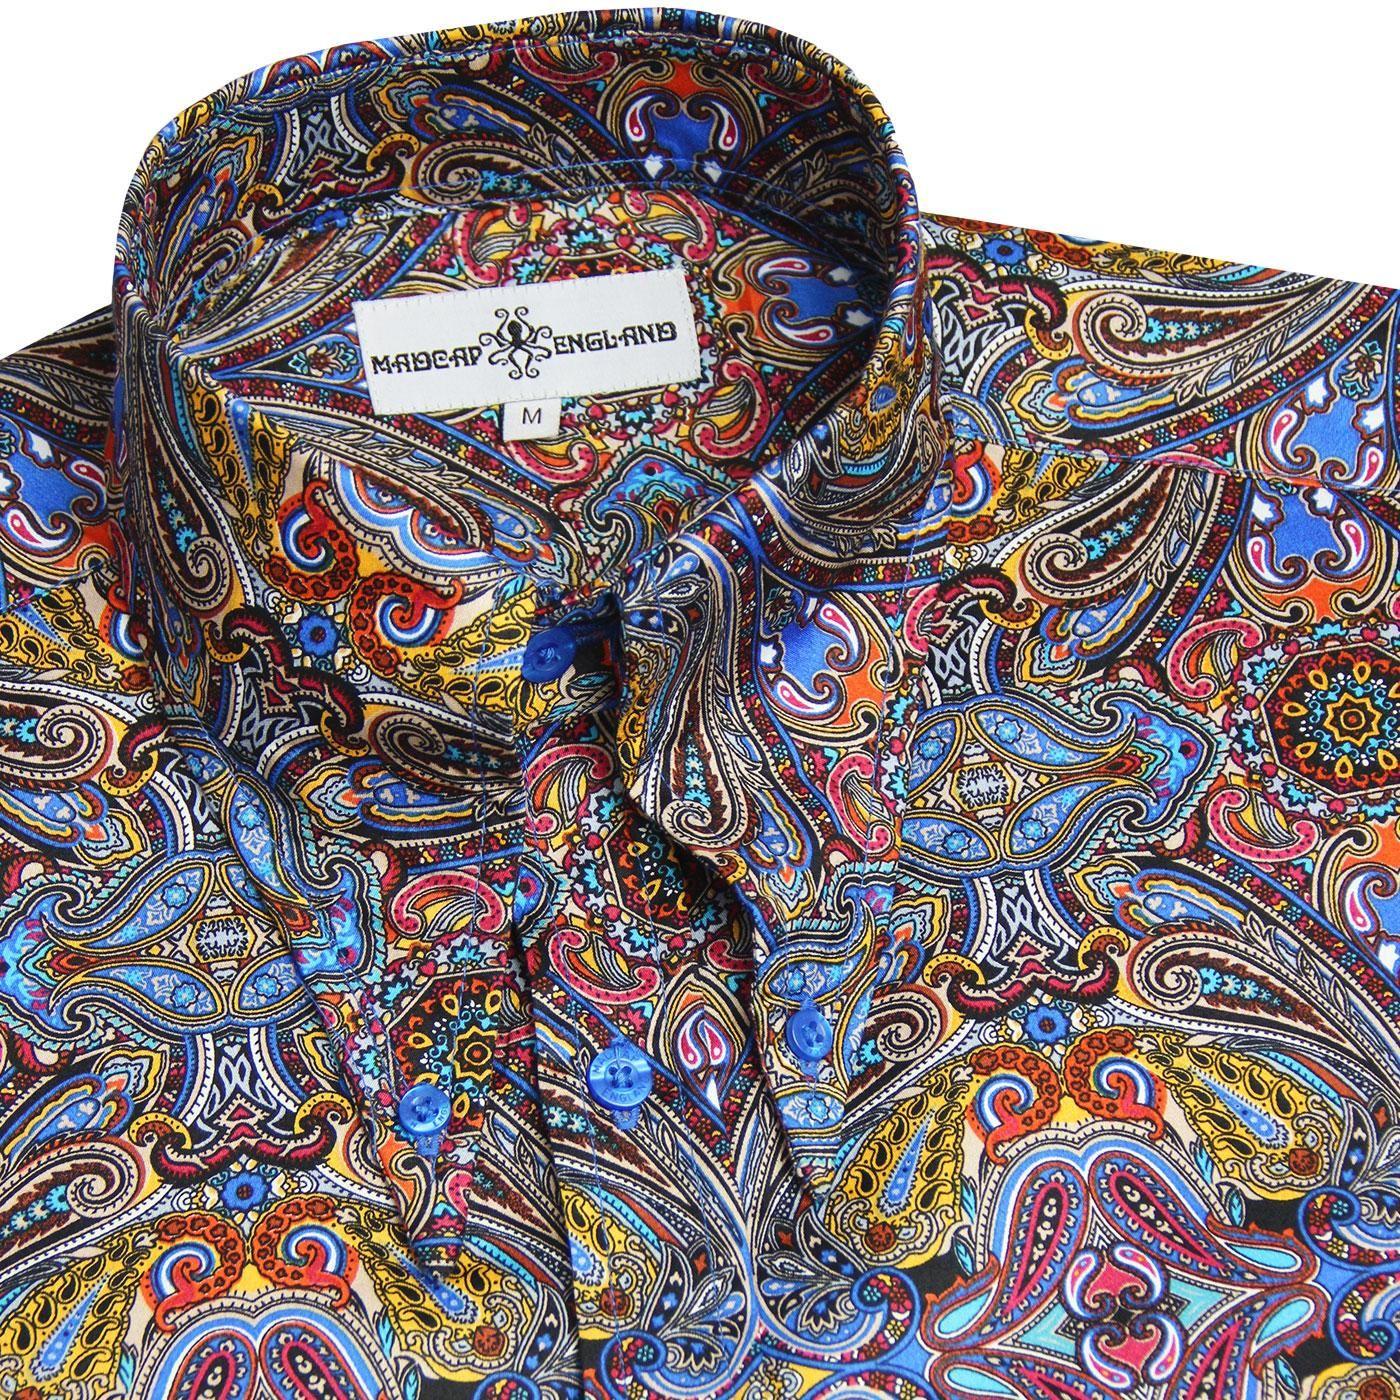 Madcap England Capo Mod Multi Paisley Spear Collar Shirt Collar